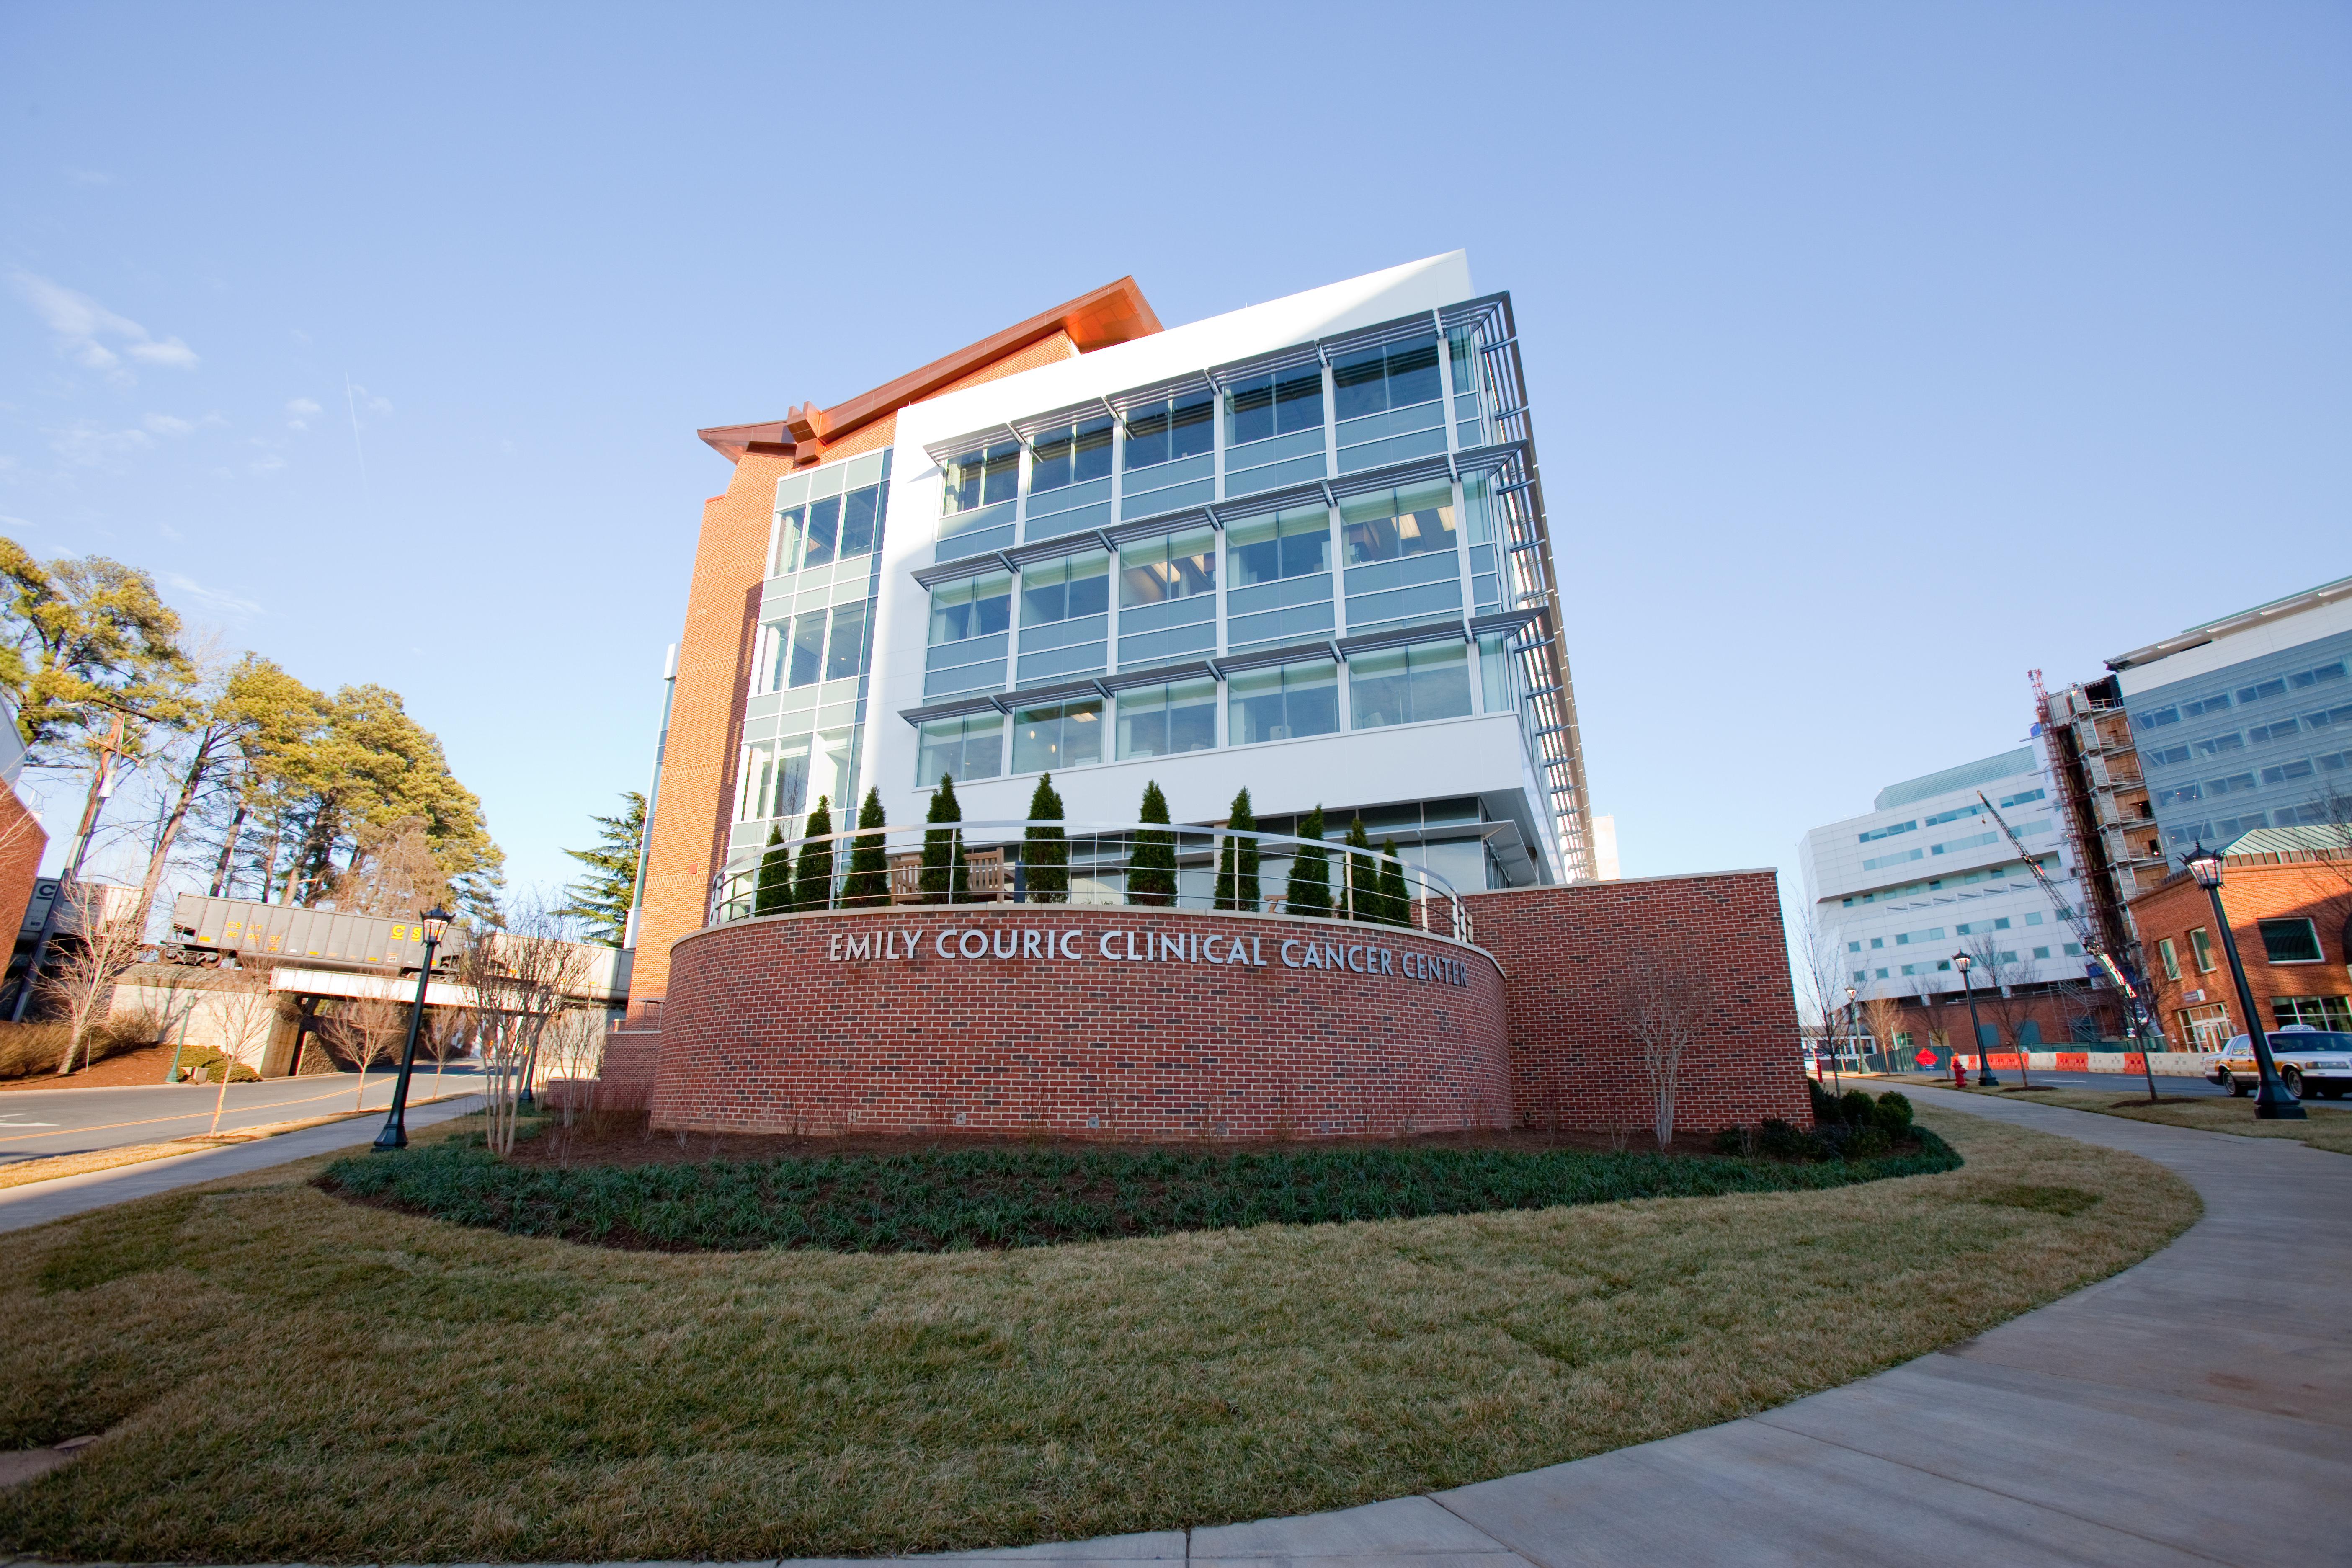 University of Virginia Medical Center